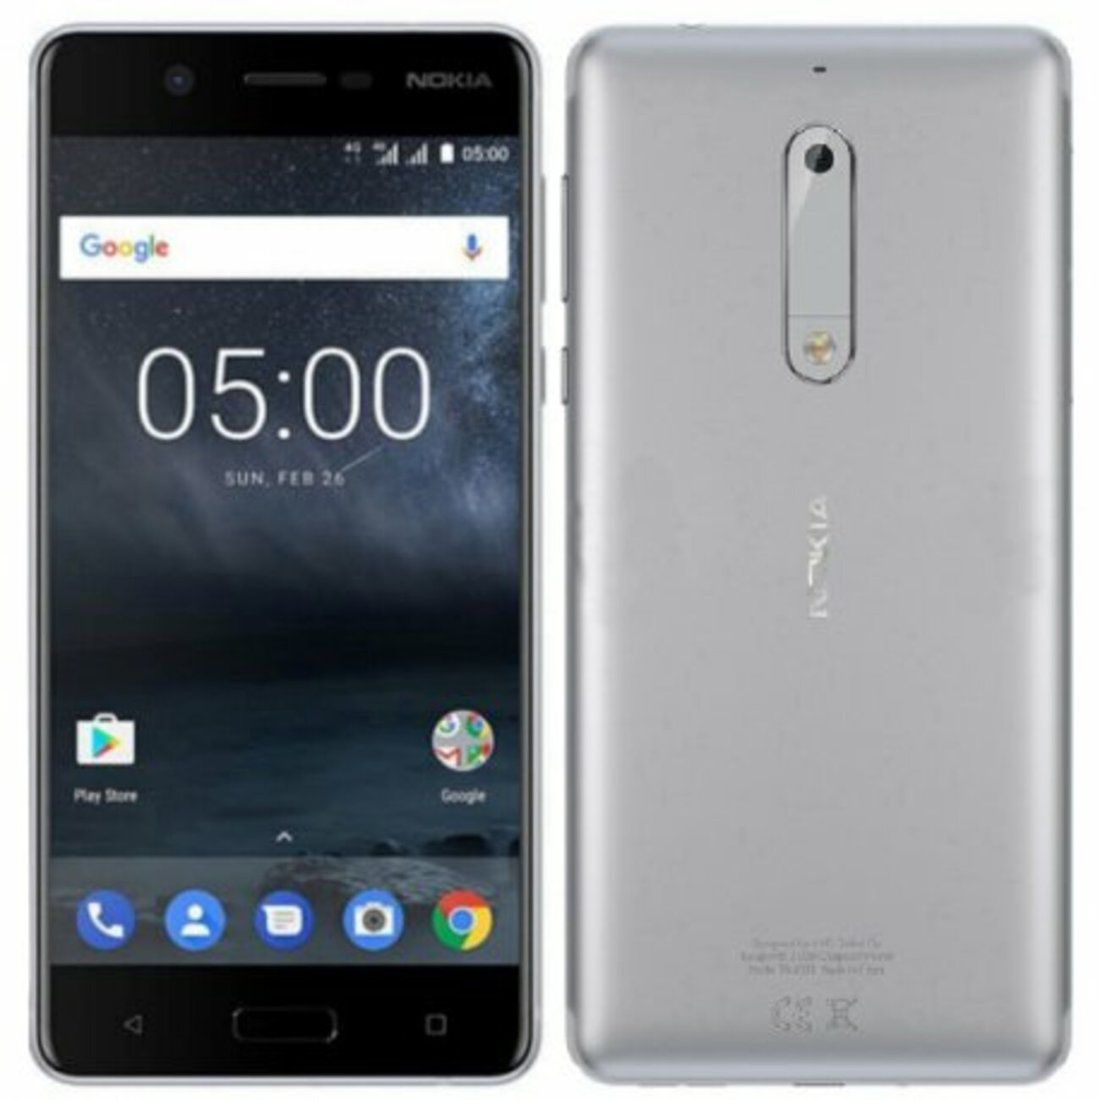 Smartphone Nokia 5 2GB Ram Tela 5.2 16GB Camera 13MP - Prata  - PAGDEPOIS